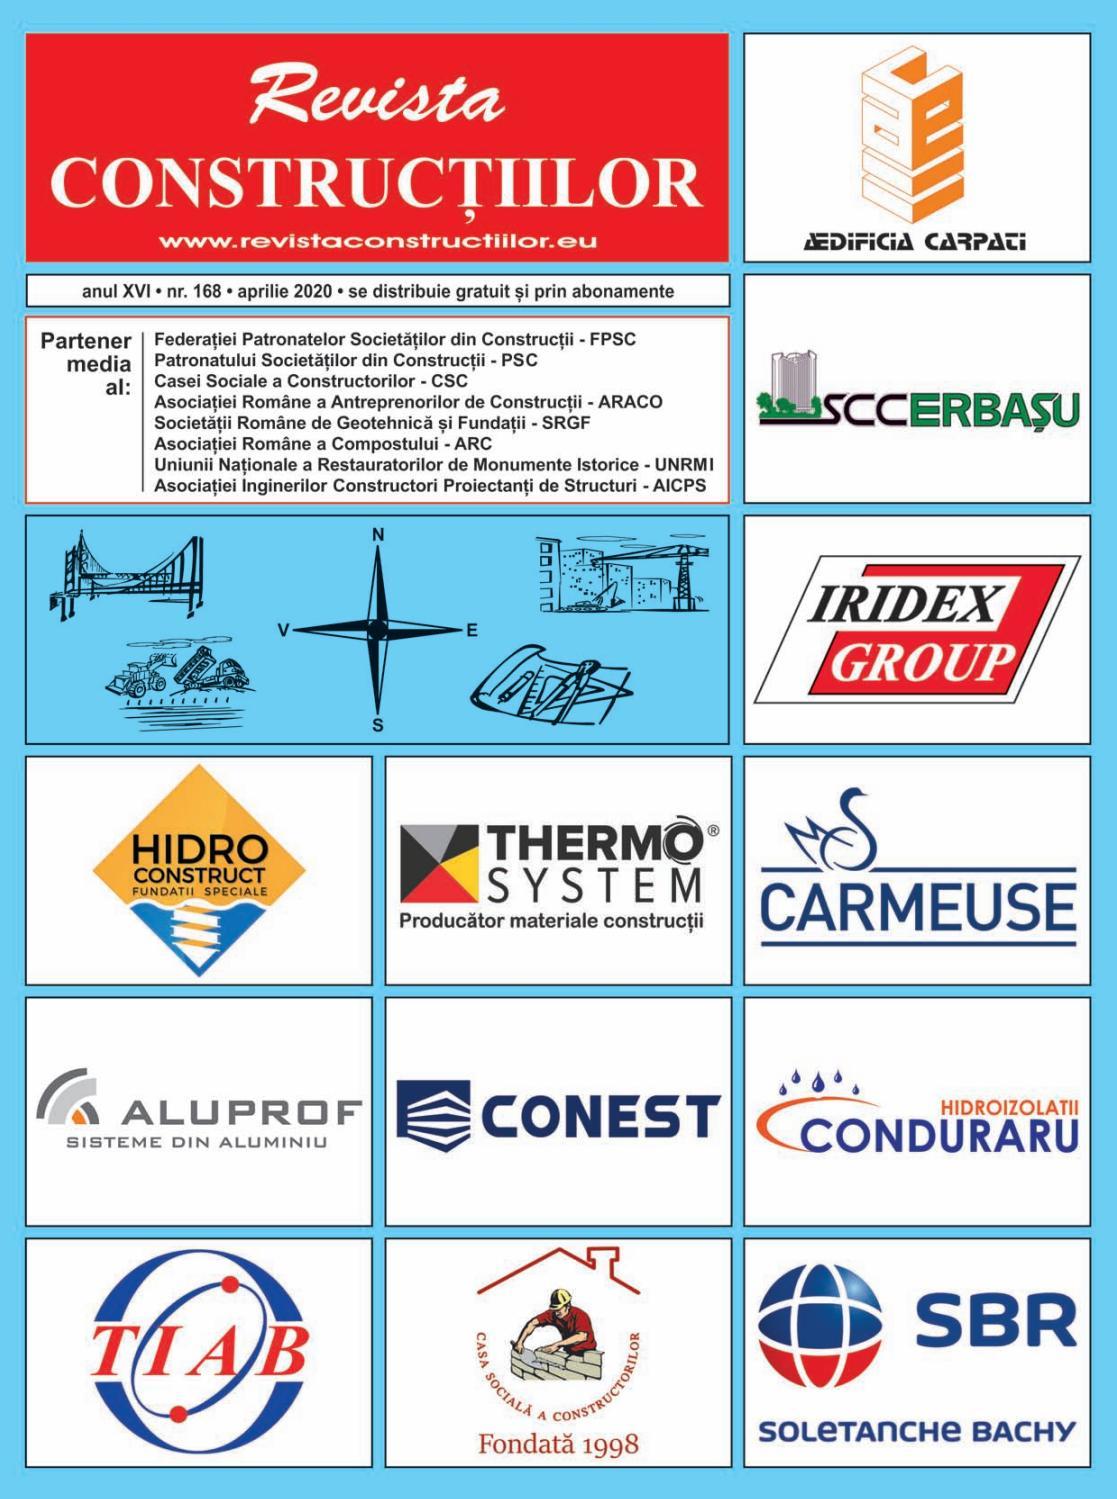 Revista Constructiilor - Nr. 168, Aprilie 2020 by Revista Constructiilor - Issuu